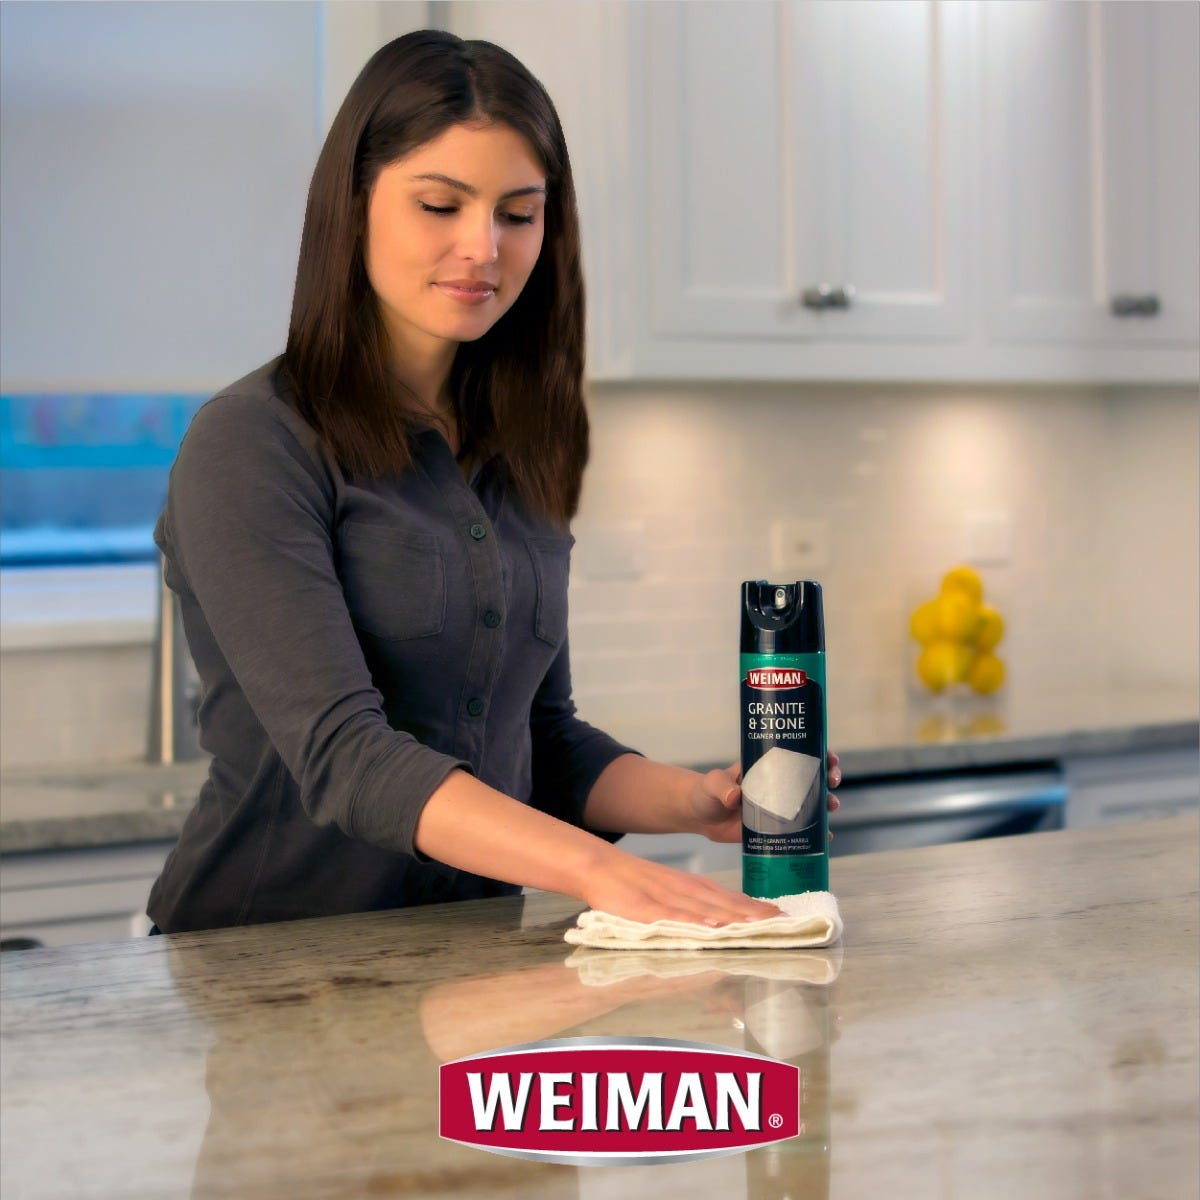 Weiman granite aerosol in use